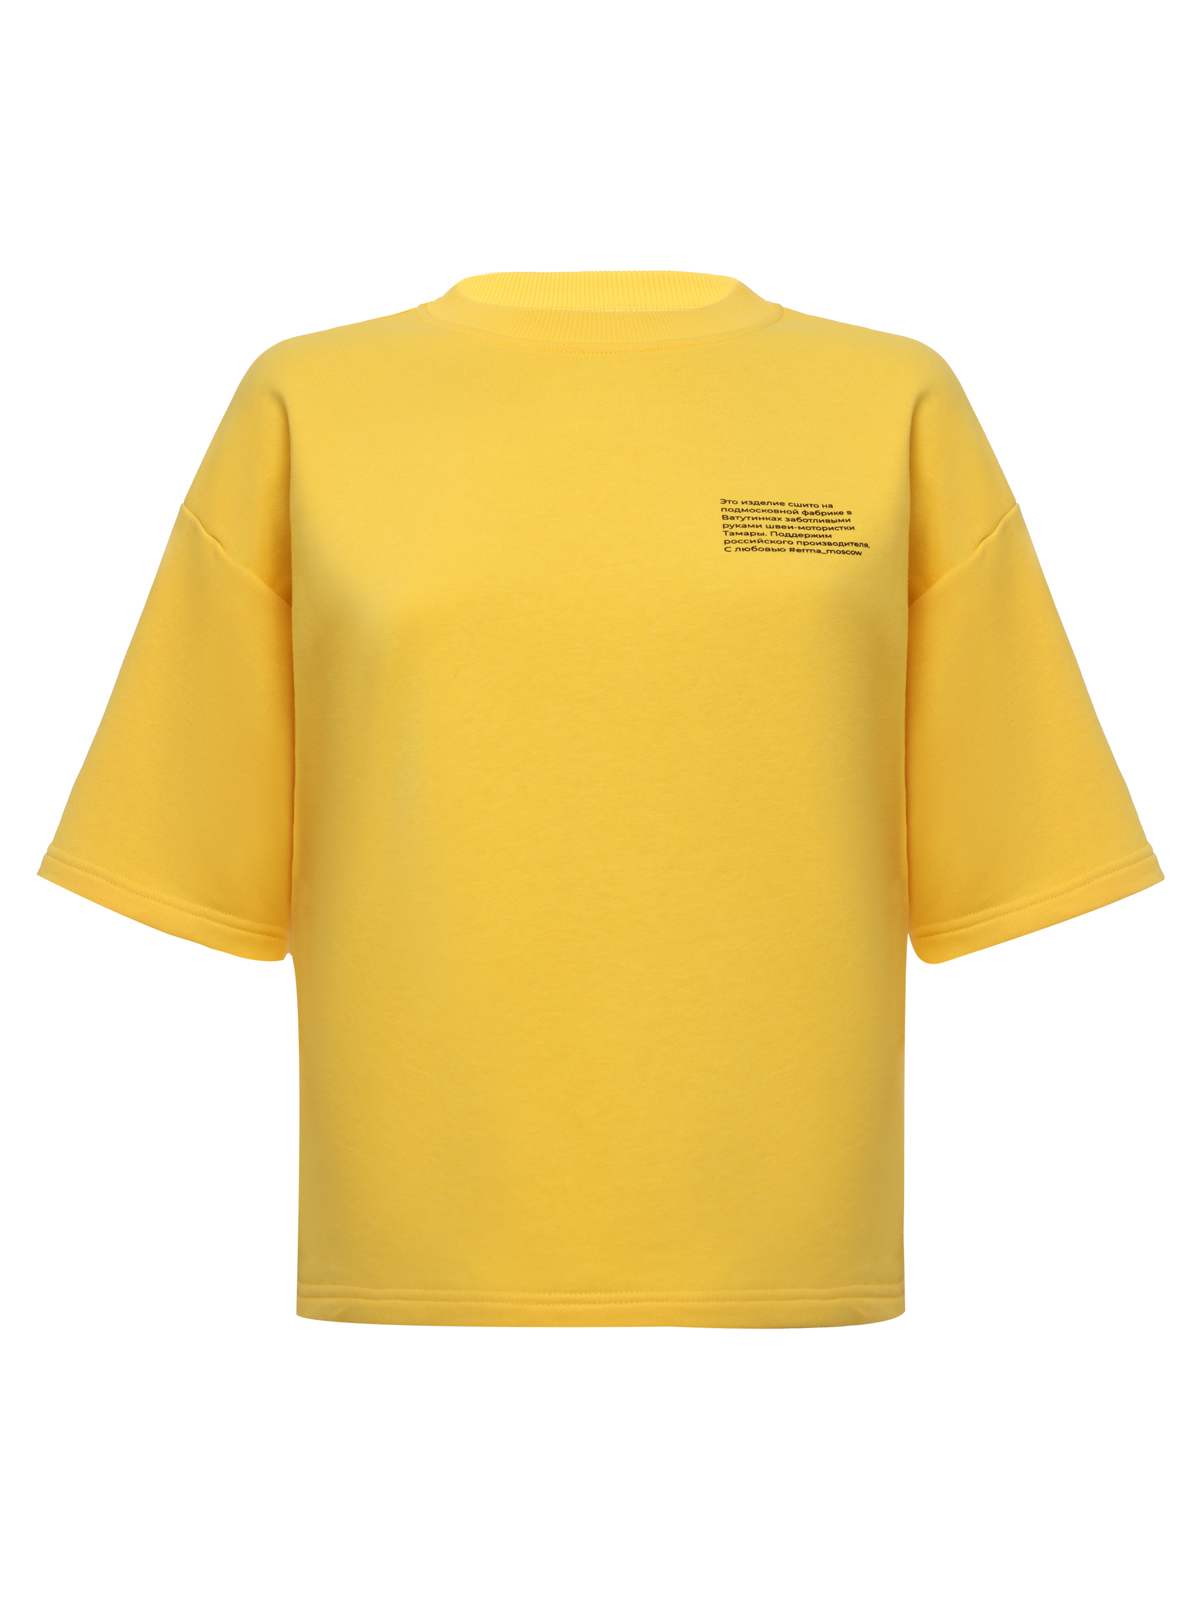 Футболка Желтая (SS0494)